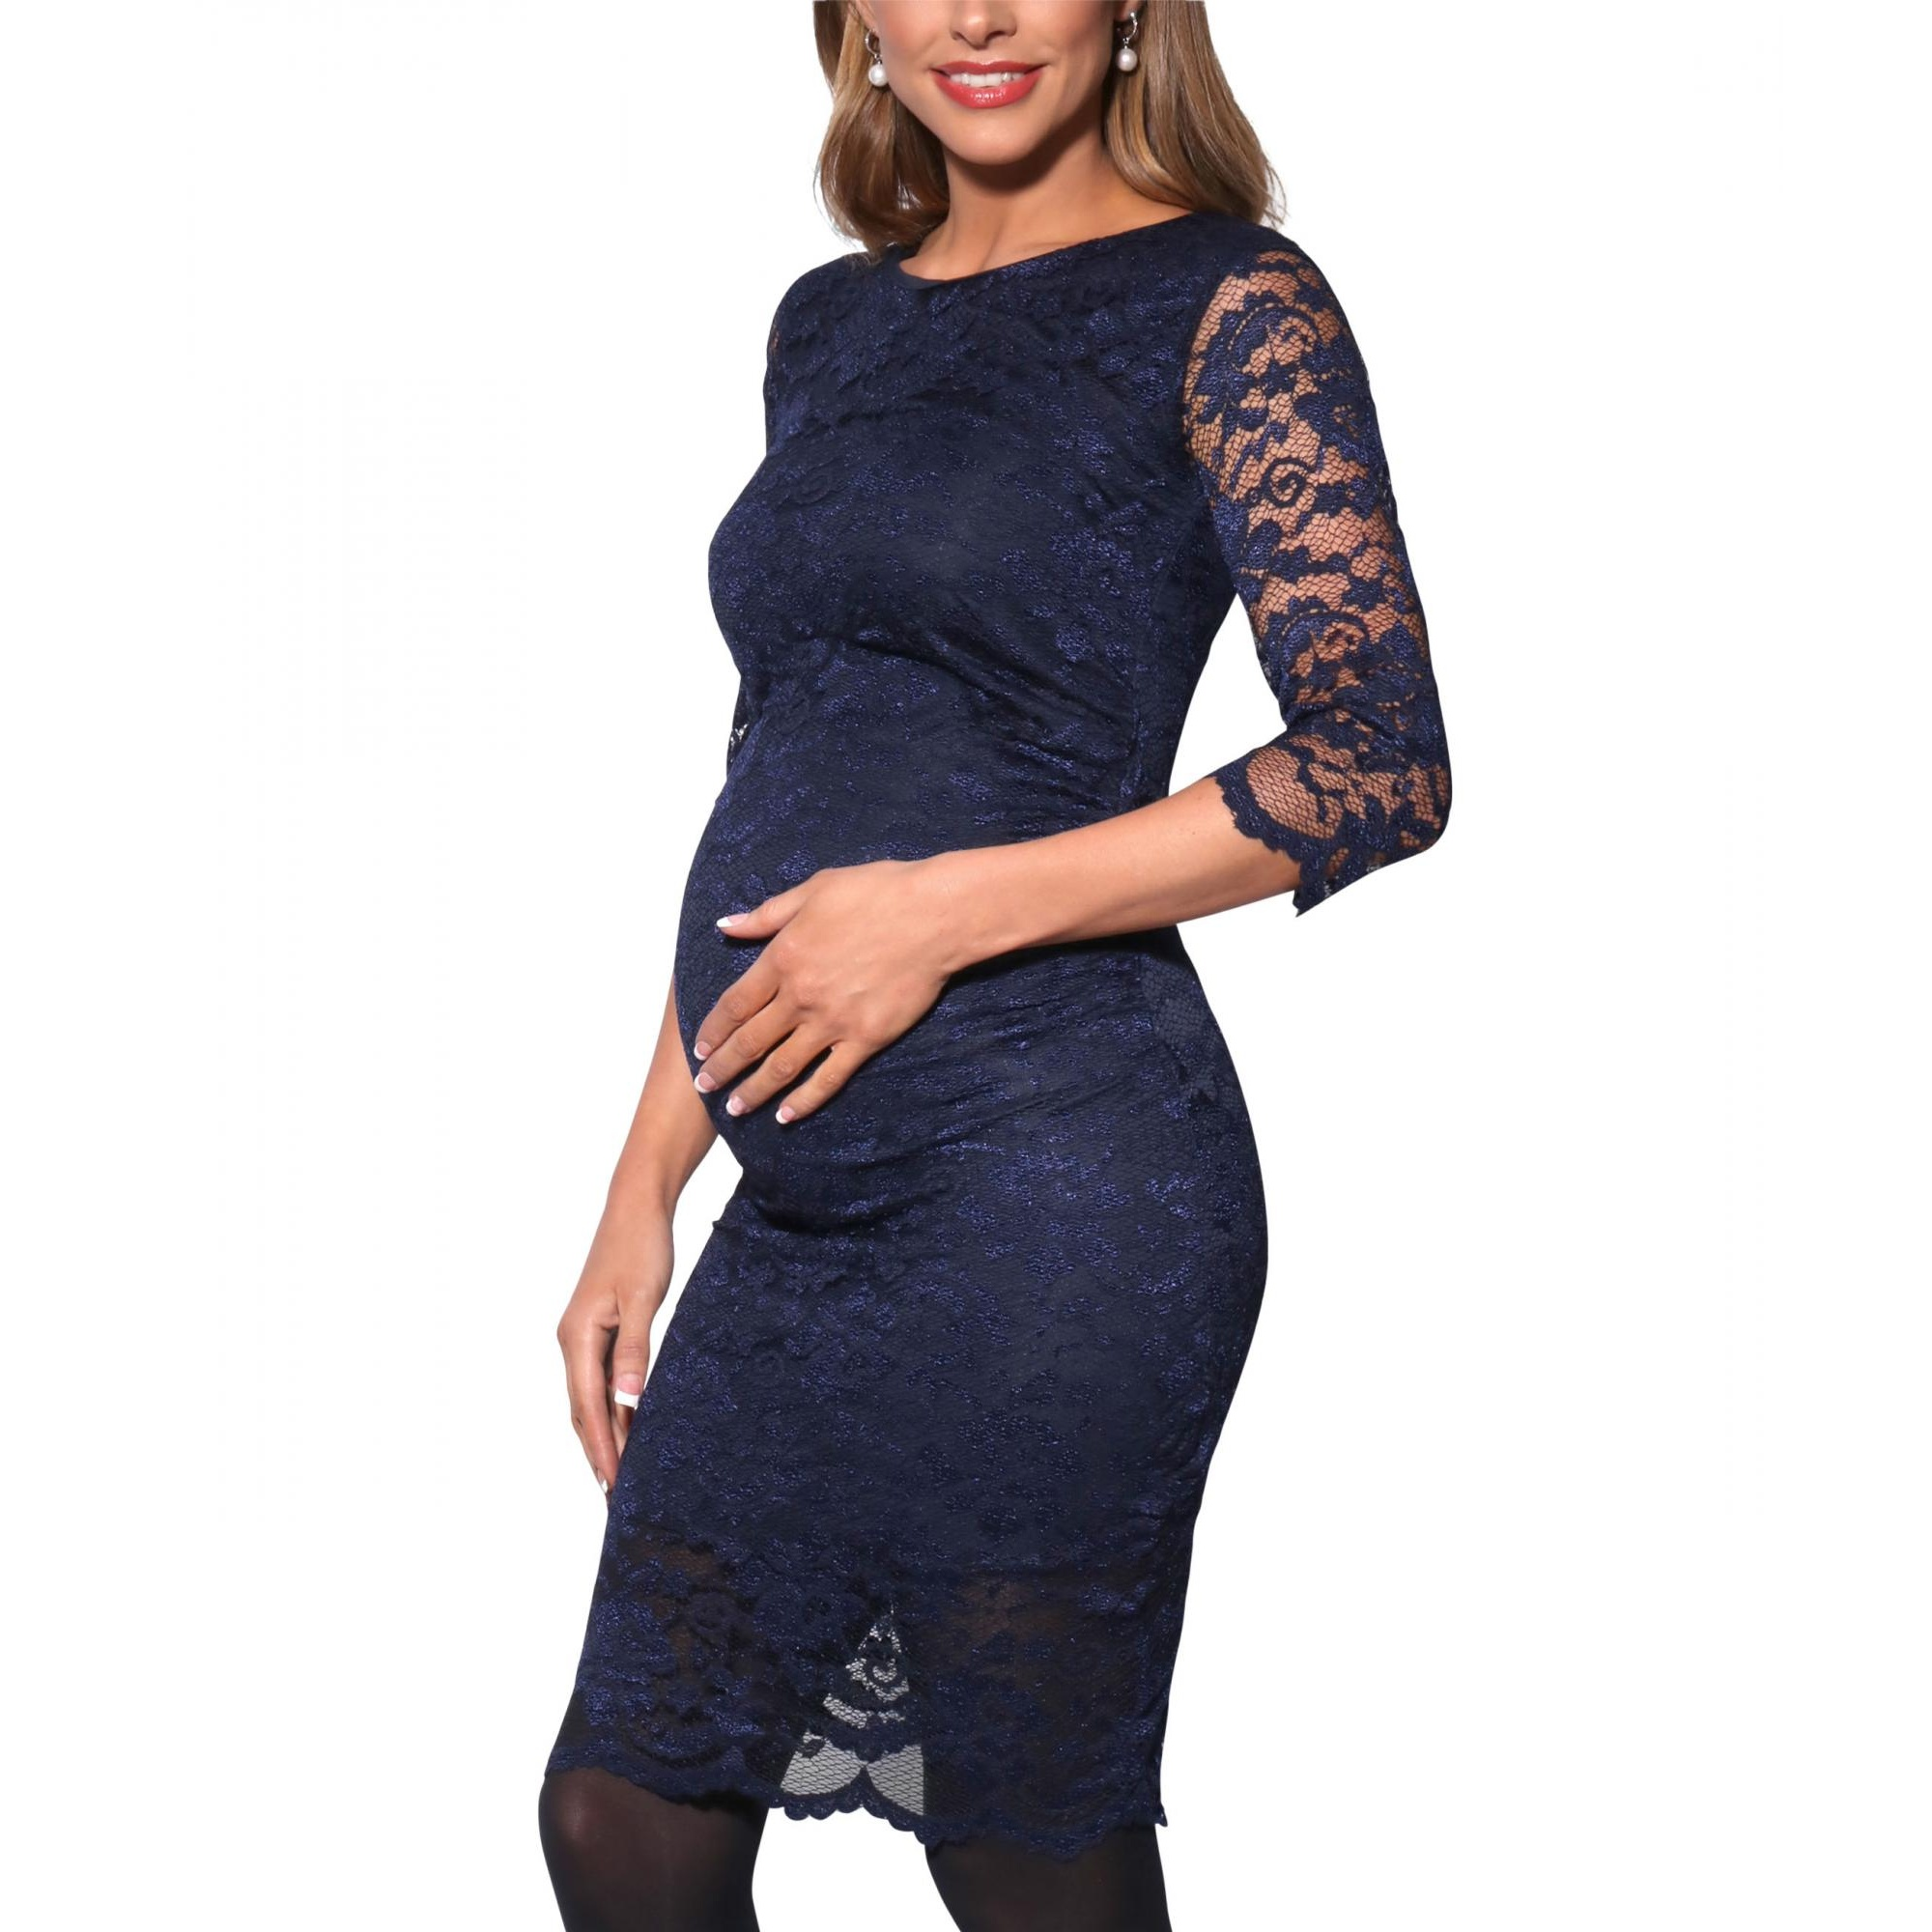 Krisp Womens/Ladies Maternity 3/4 Length Sleeve Lace Midi Dress (M) (Navy)